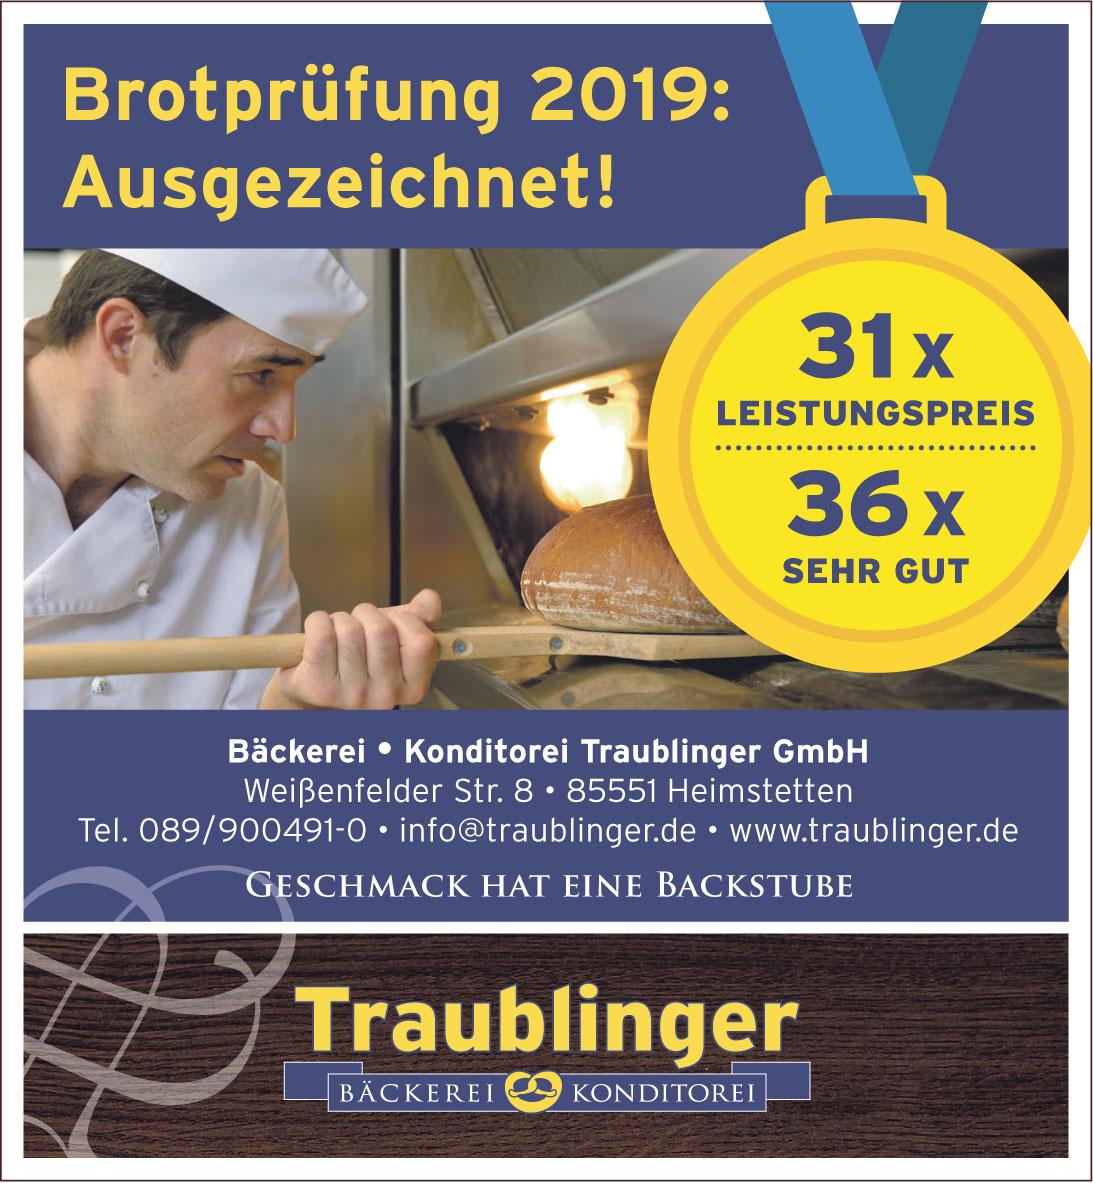 Bäckerei Konditorei Traublinger GmbH